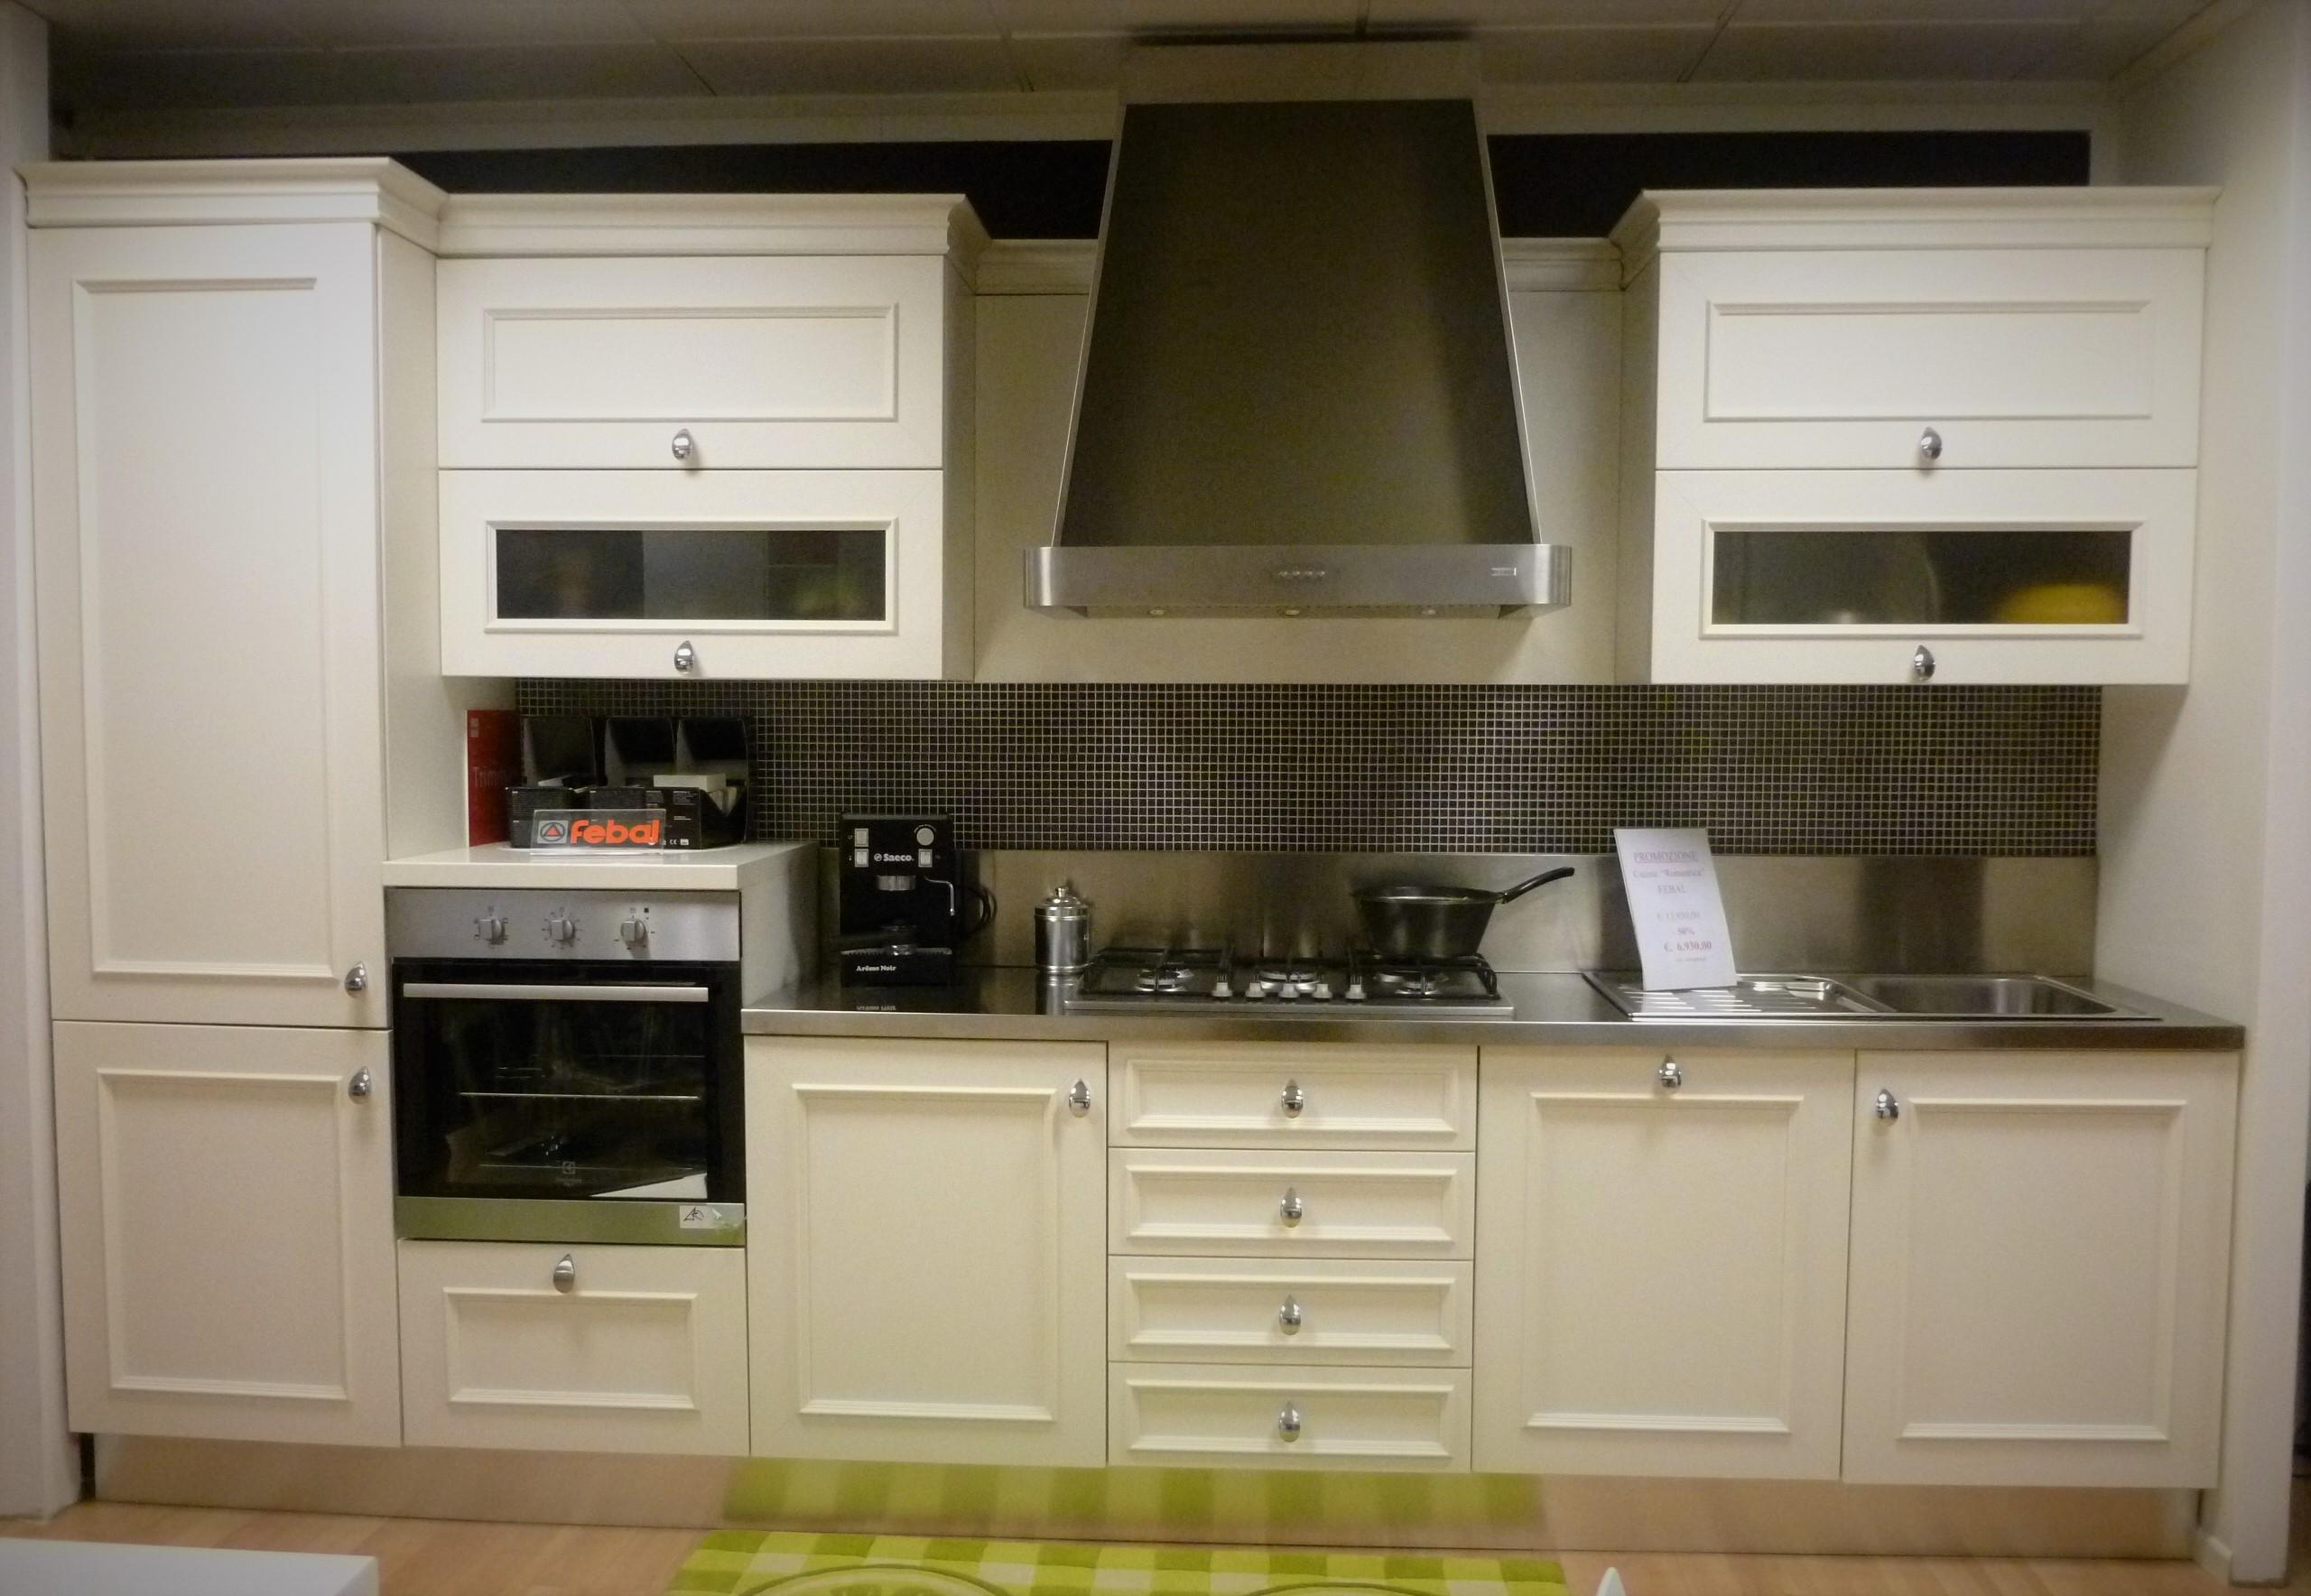 Cucine Febal Foto. Febal Cucine Classiche Collezione Romantica With ...